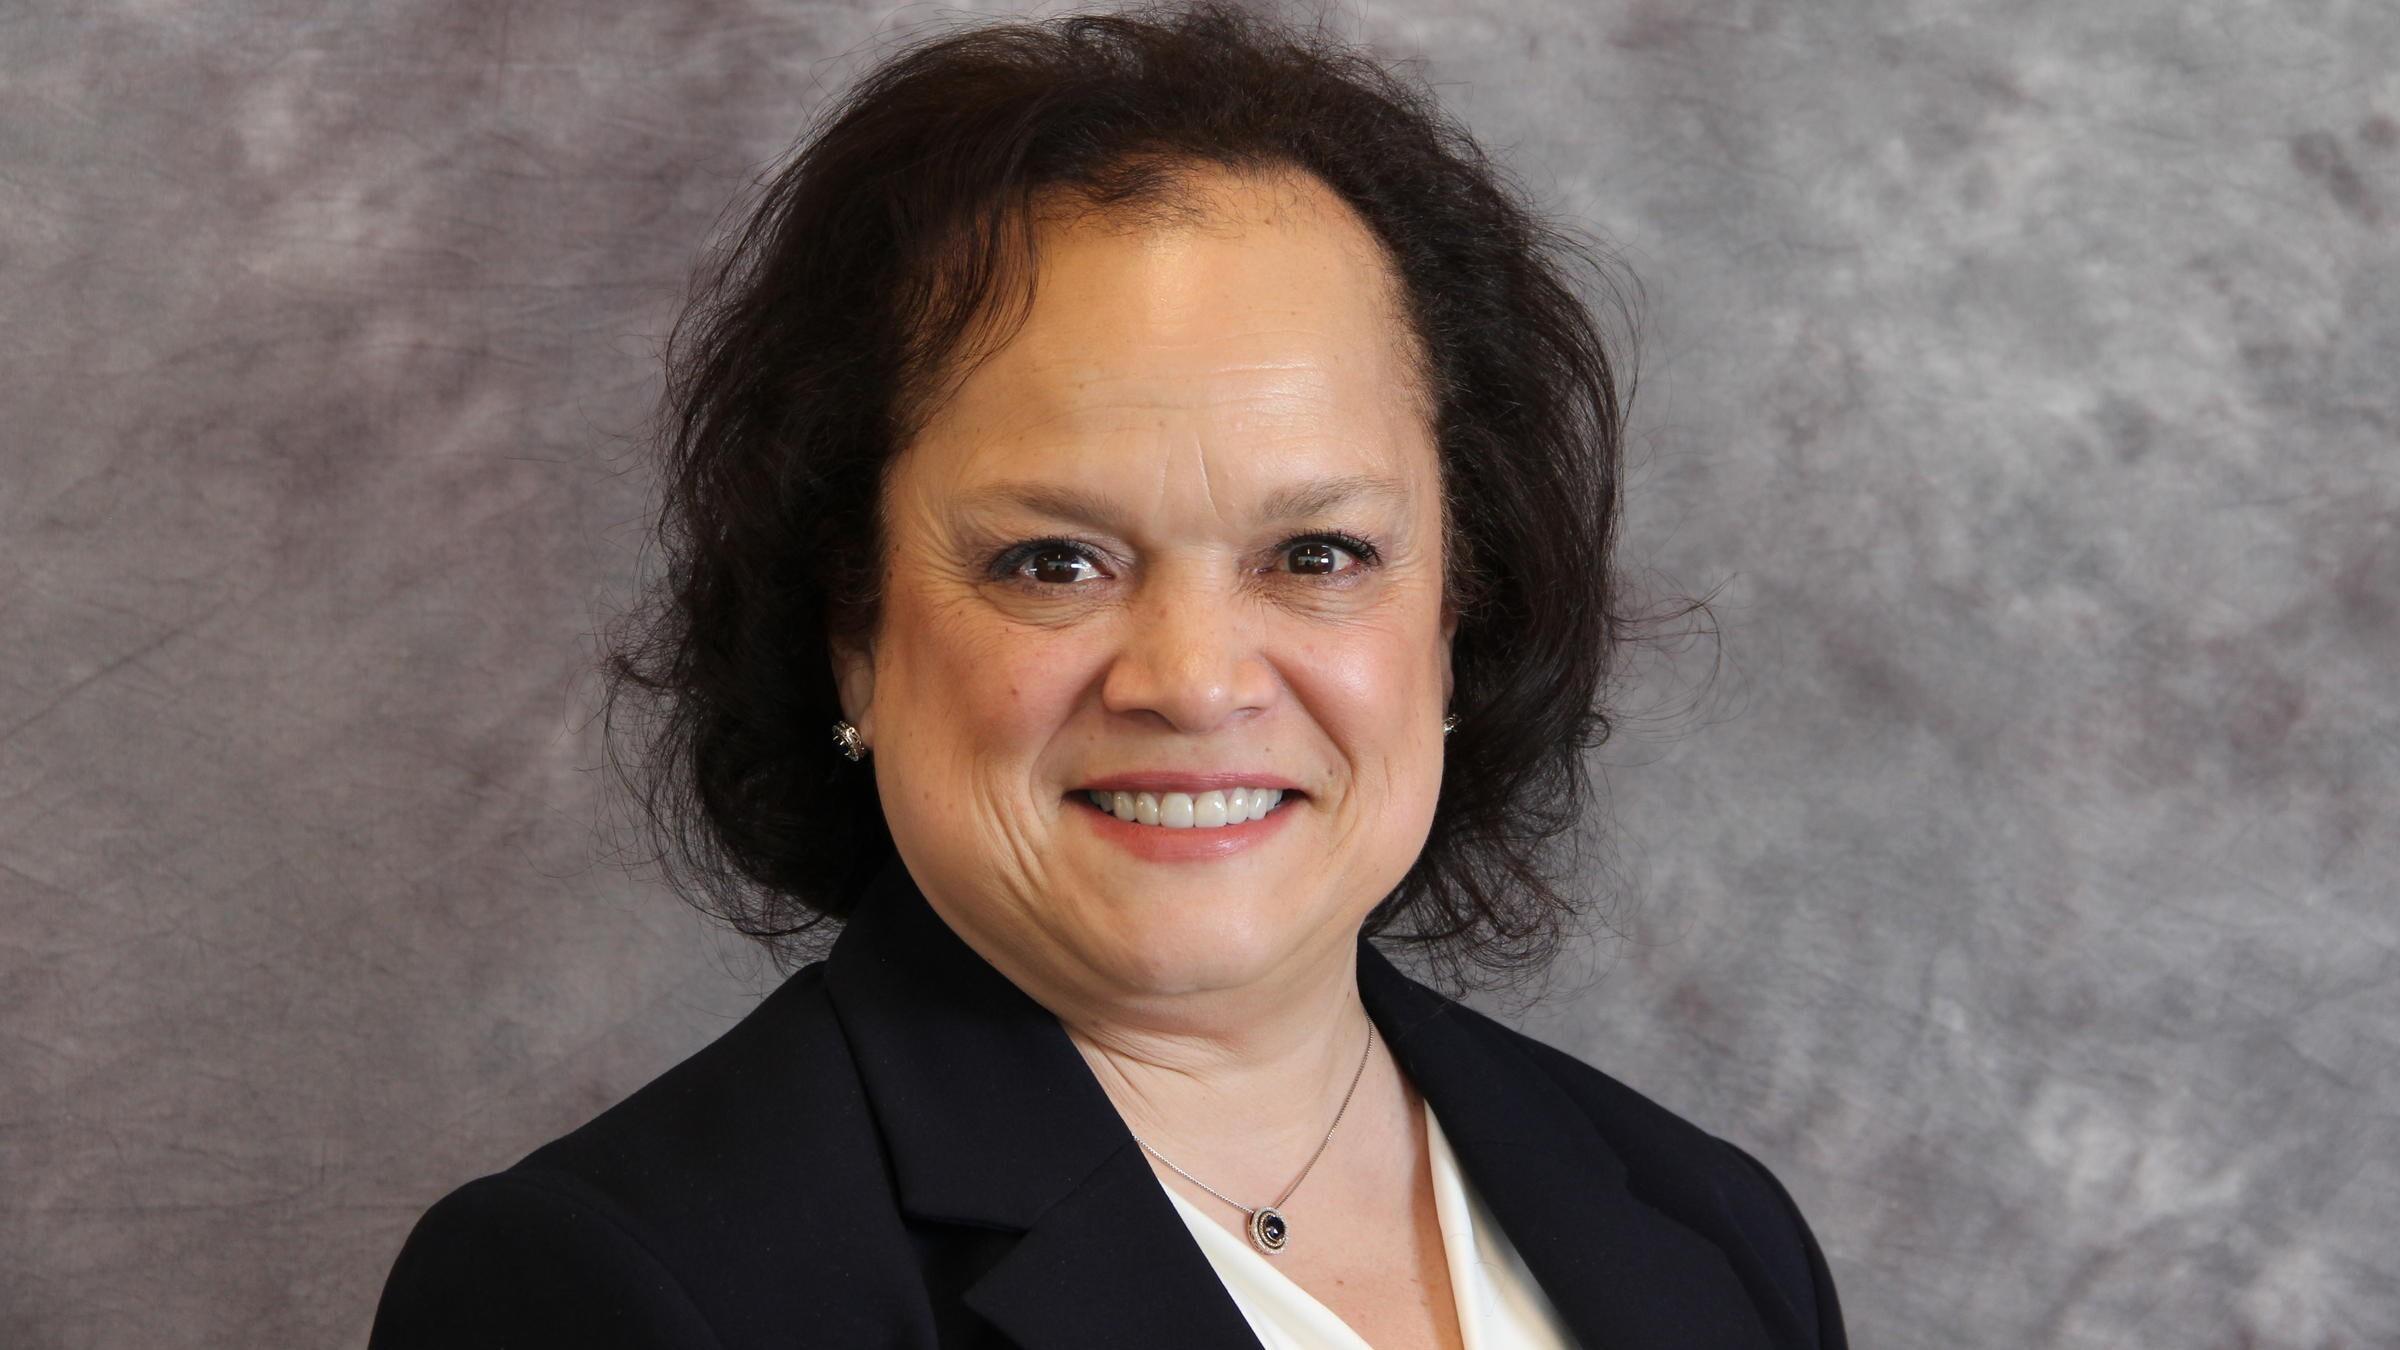 Carmen Ayala, State Superintendent of Education